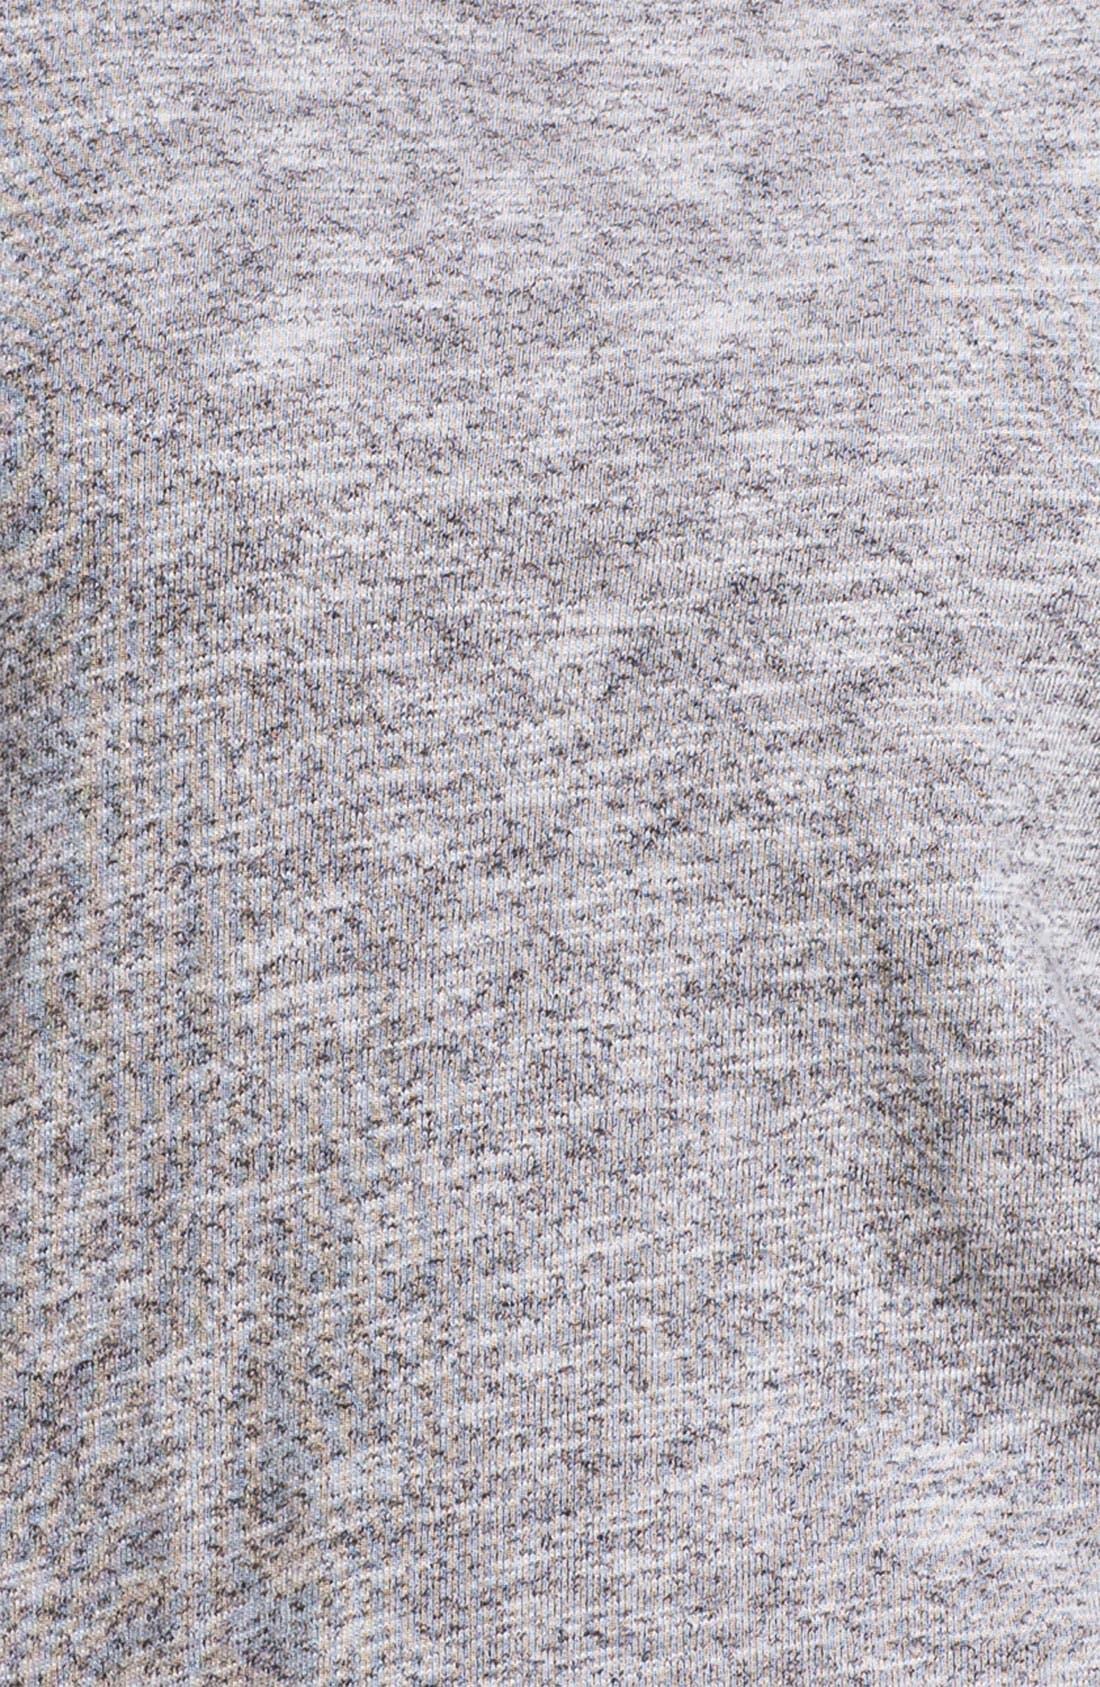 Slouchy Back Sweatshirt,                             Alternate thumbnail 2, color,                             039